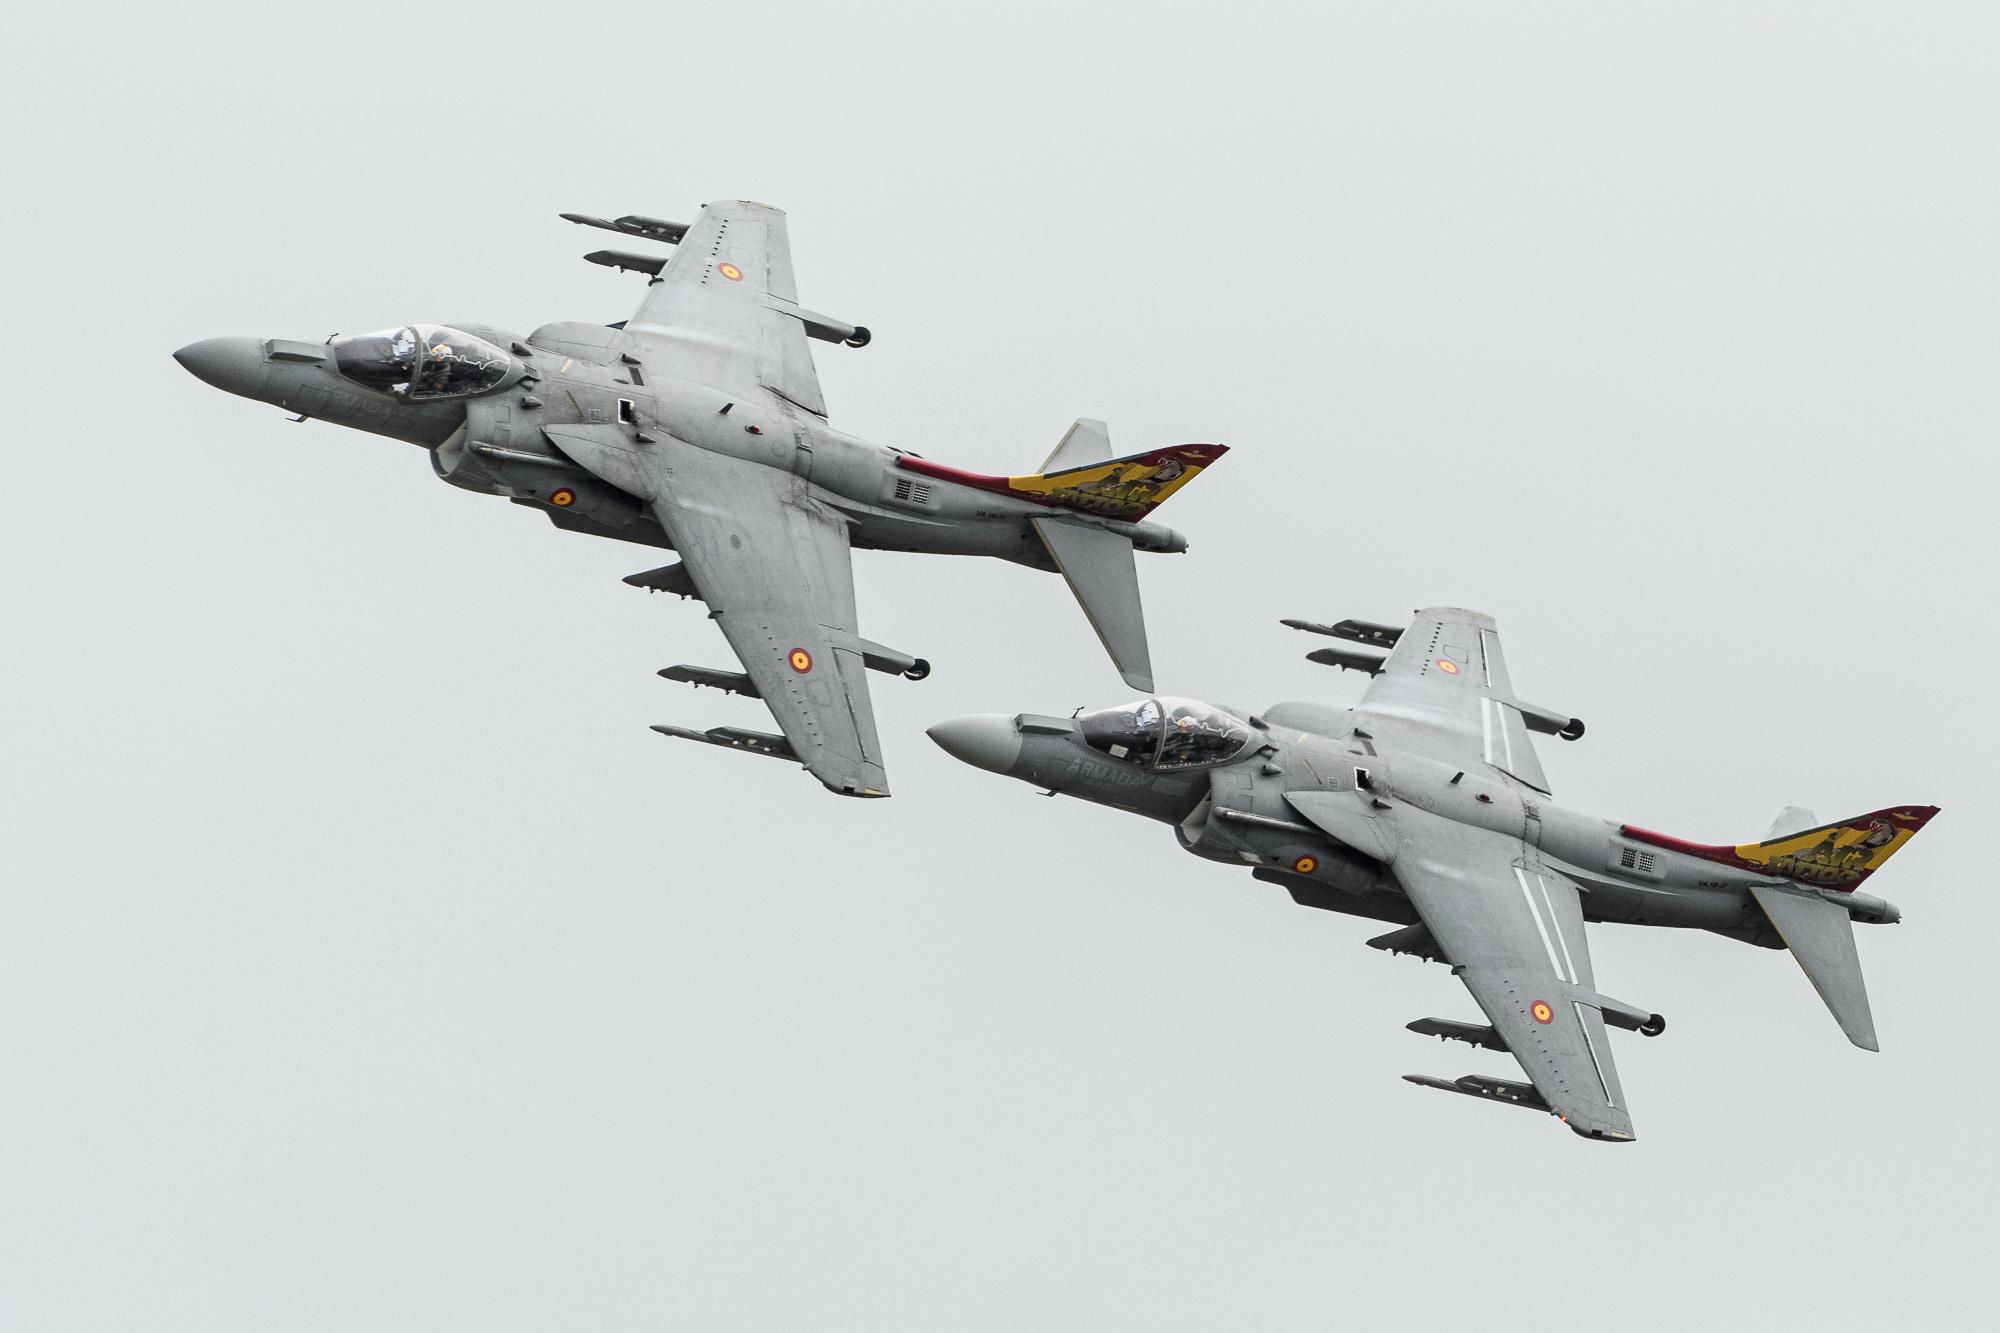 Spanish Harrier pair